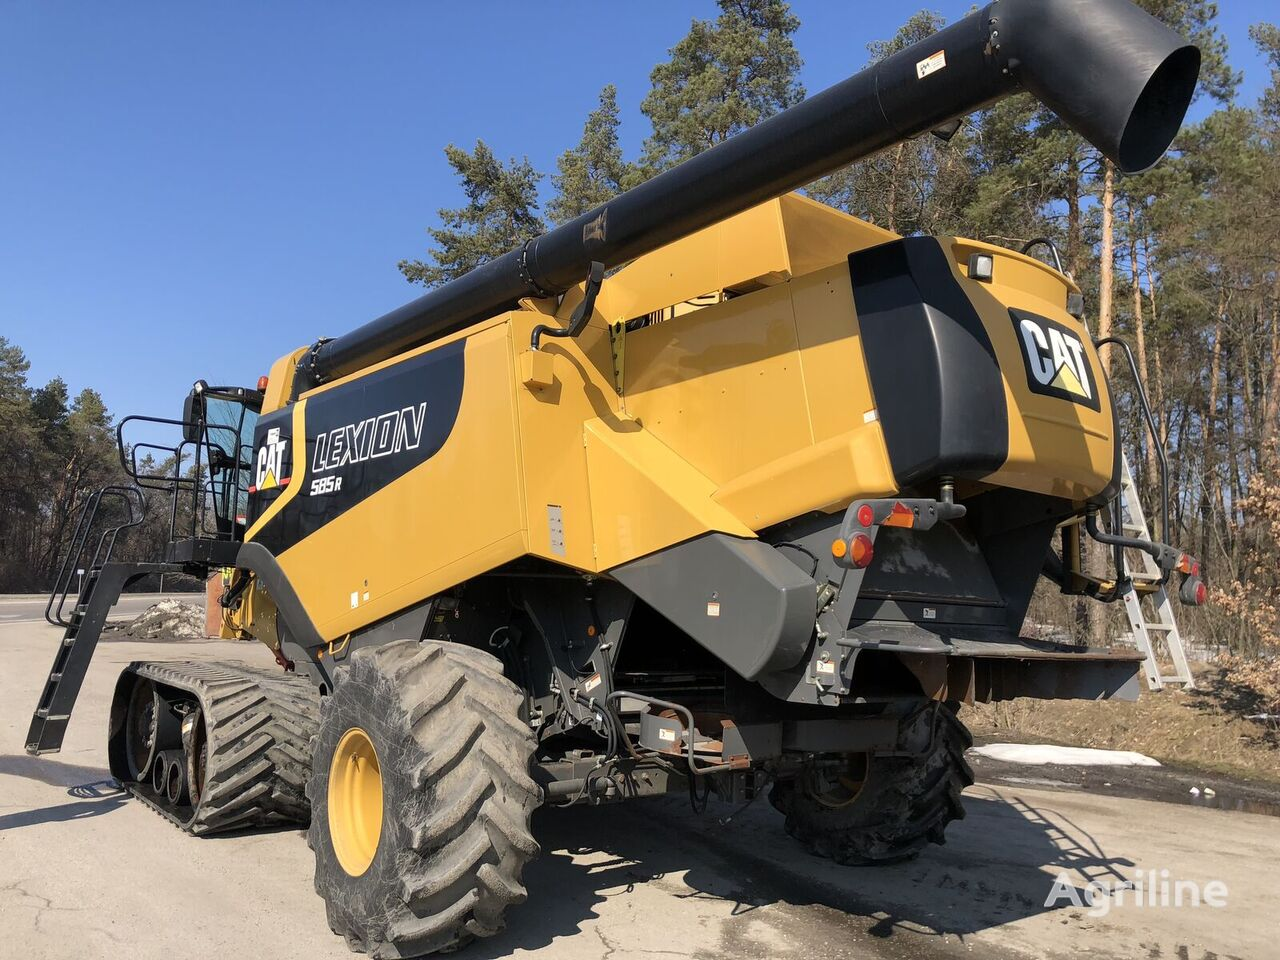 CLAAS LEXION 585R grain harvester